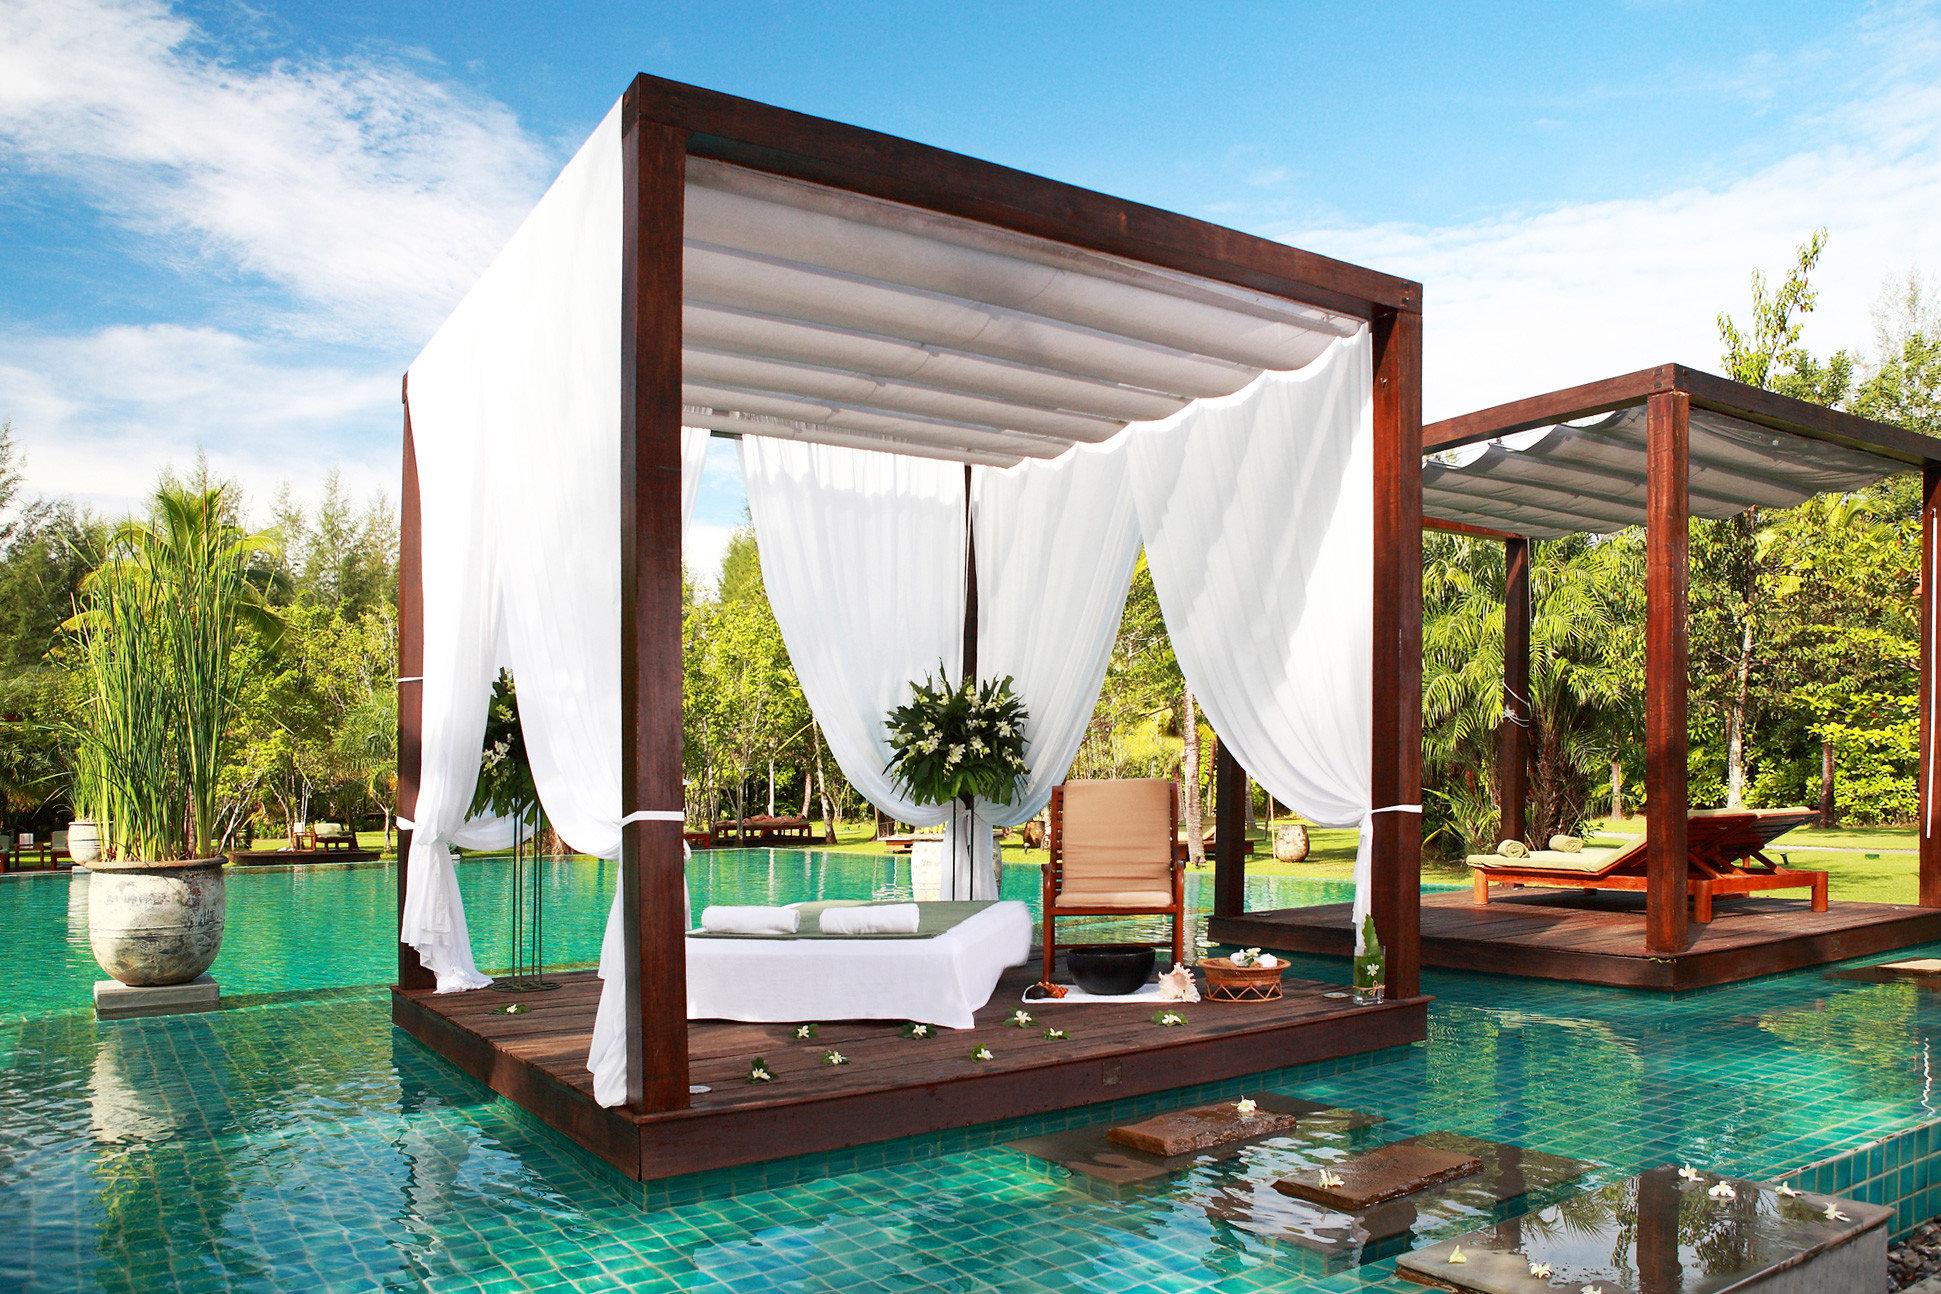 Deck Lounge Luxury Pool Tropical sky water leisure swimming pool property Resort Villa backyard pavilion swimming